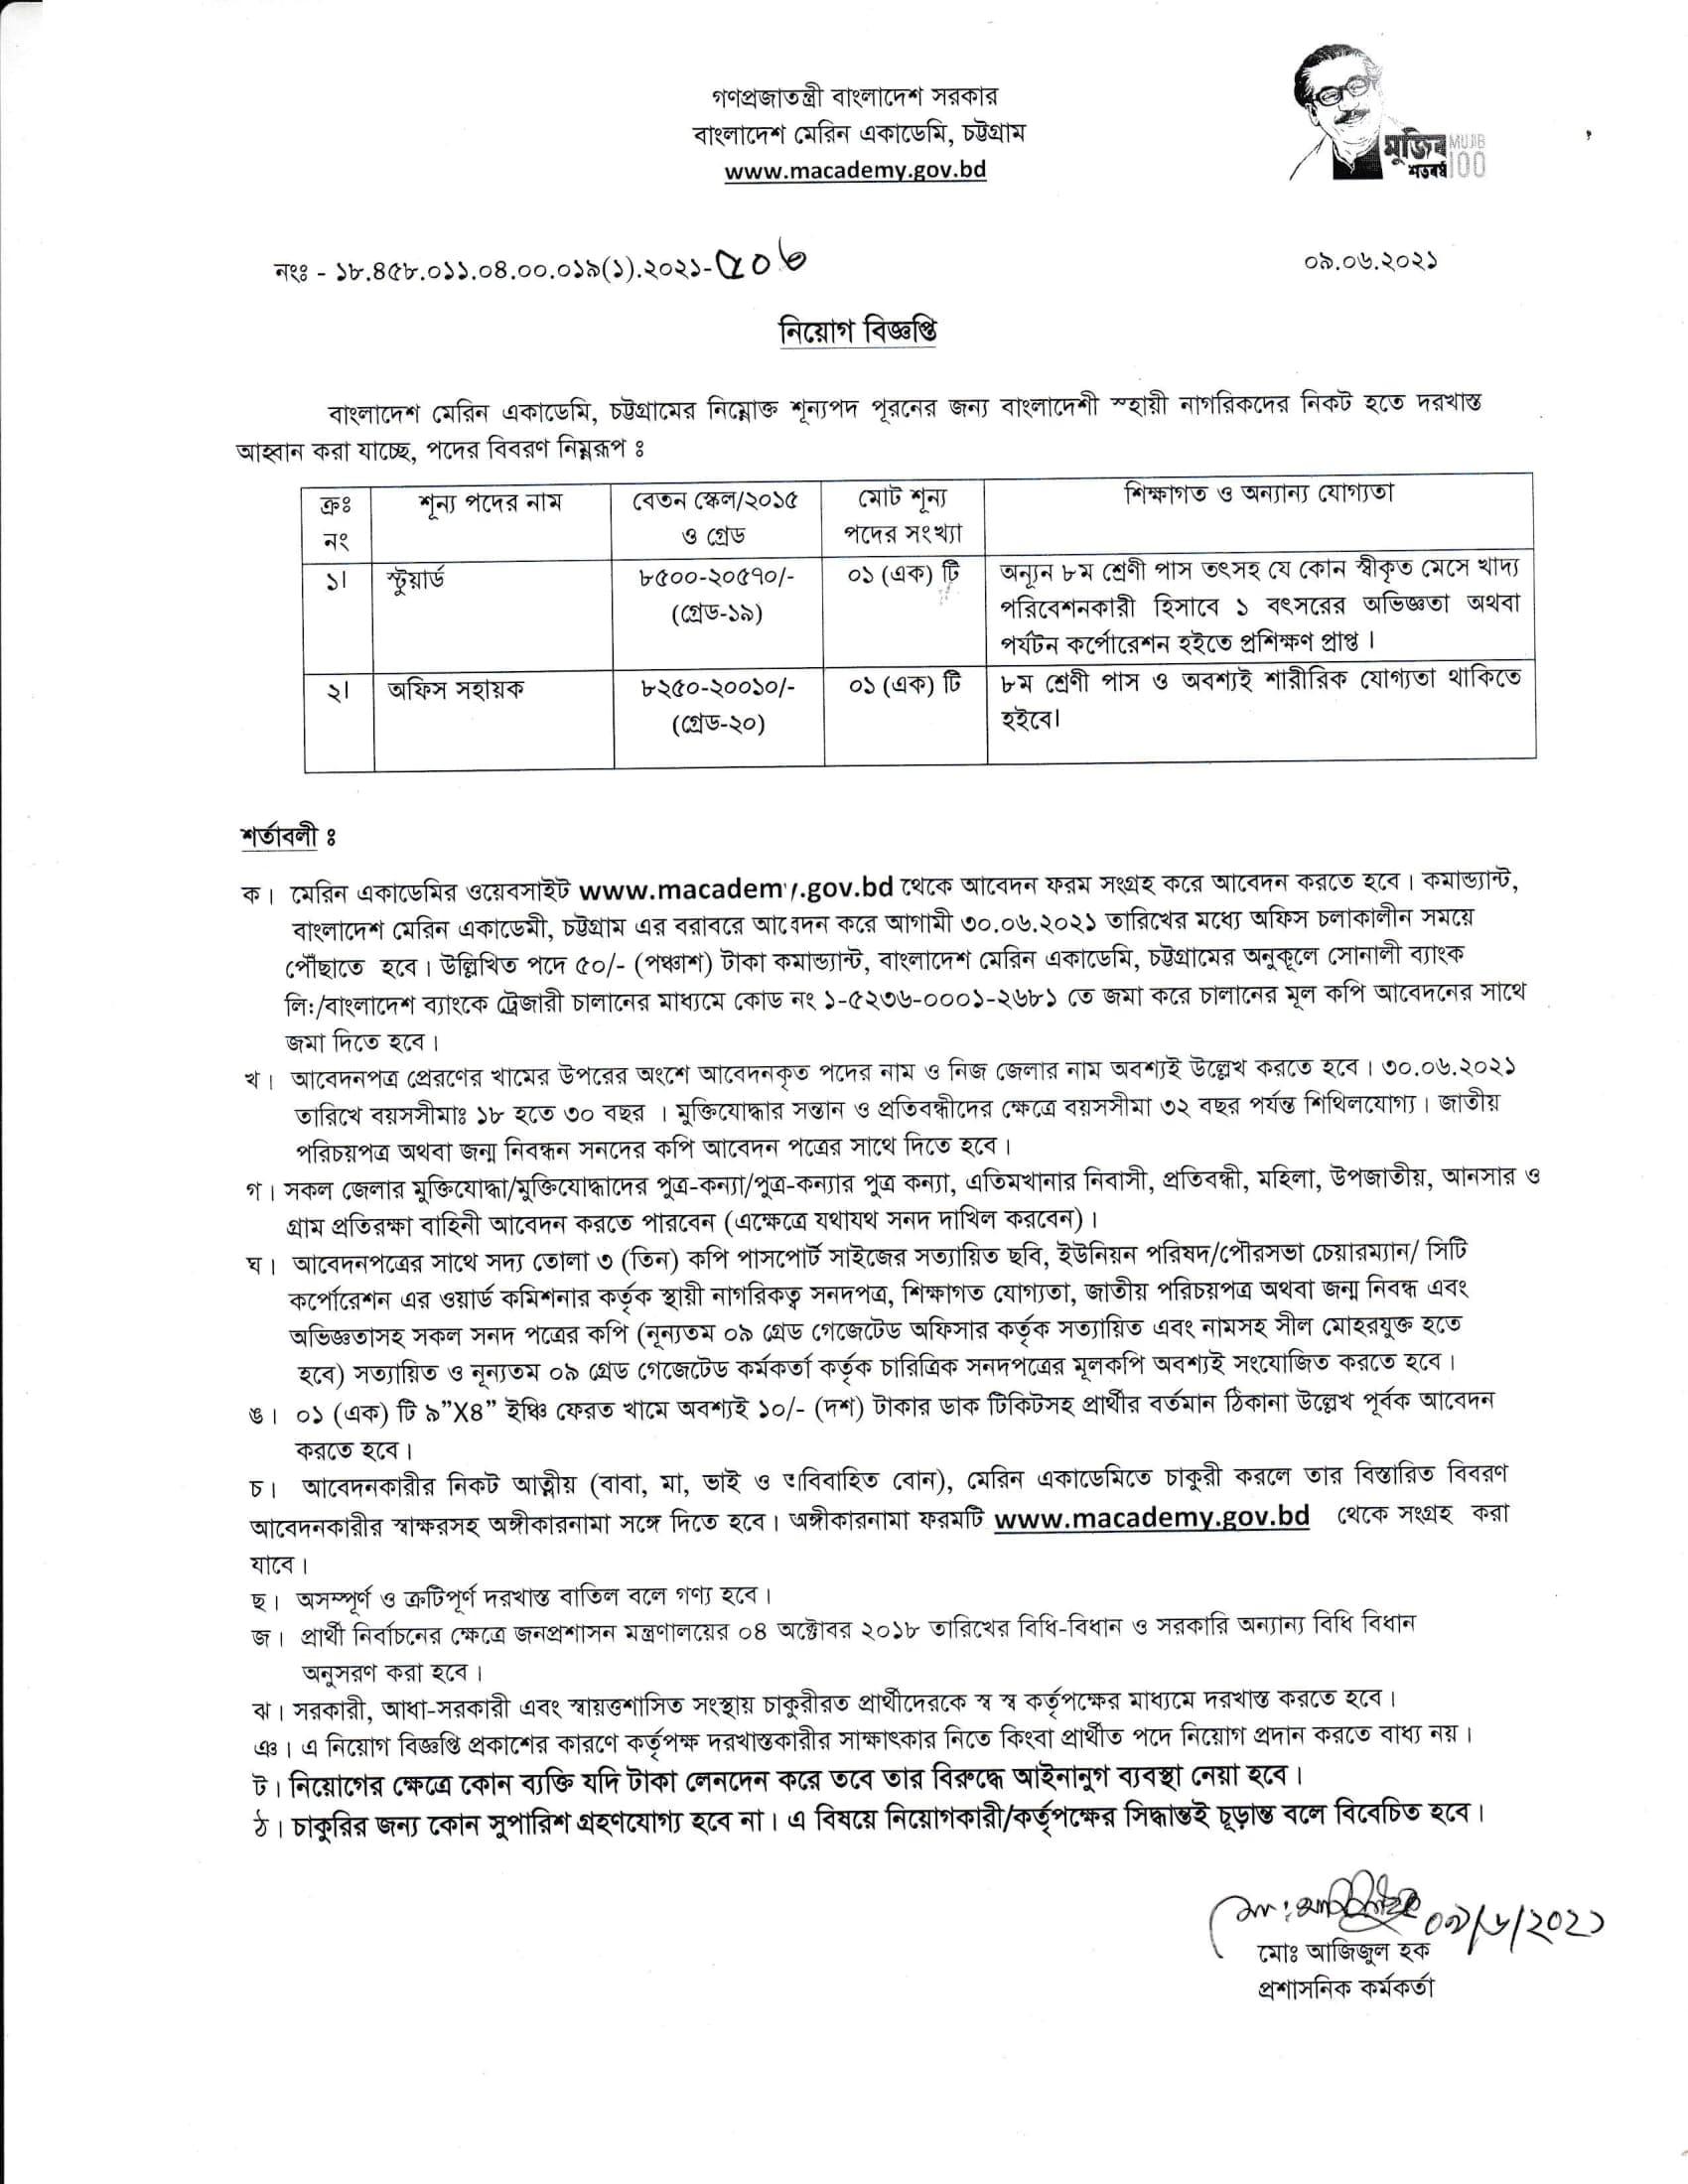 Bangladesh Marine Academy Job Circular 2021